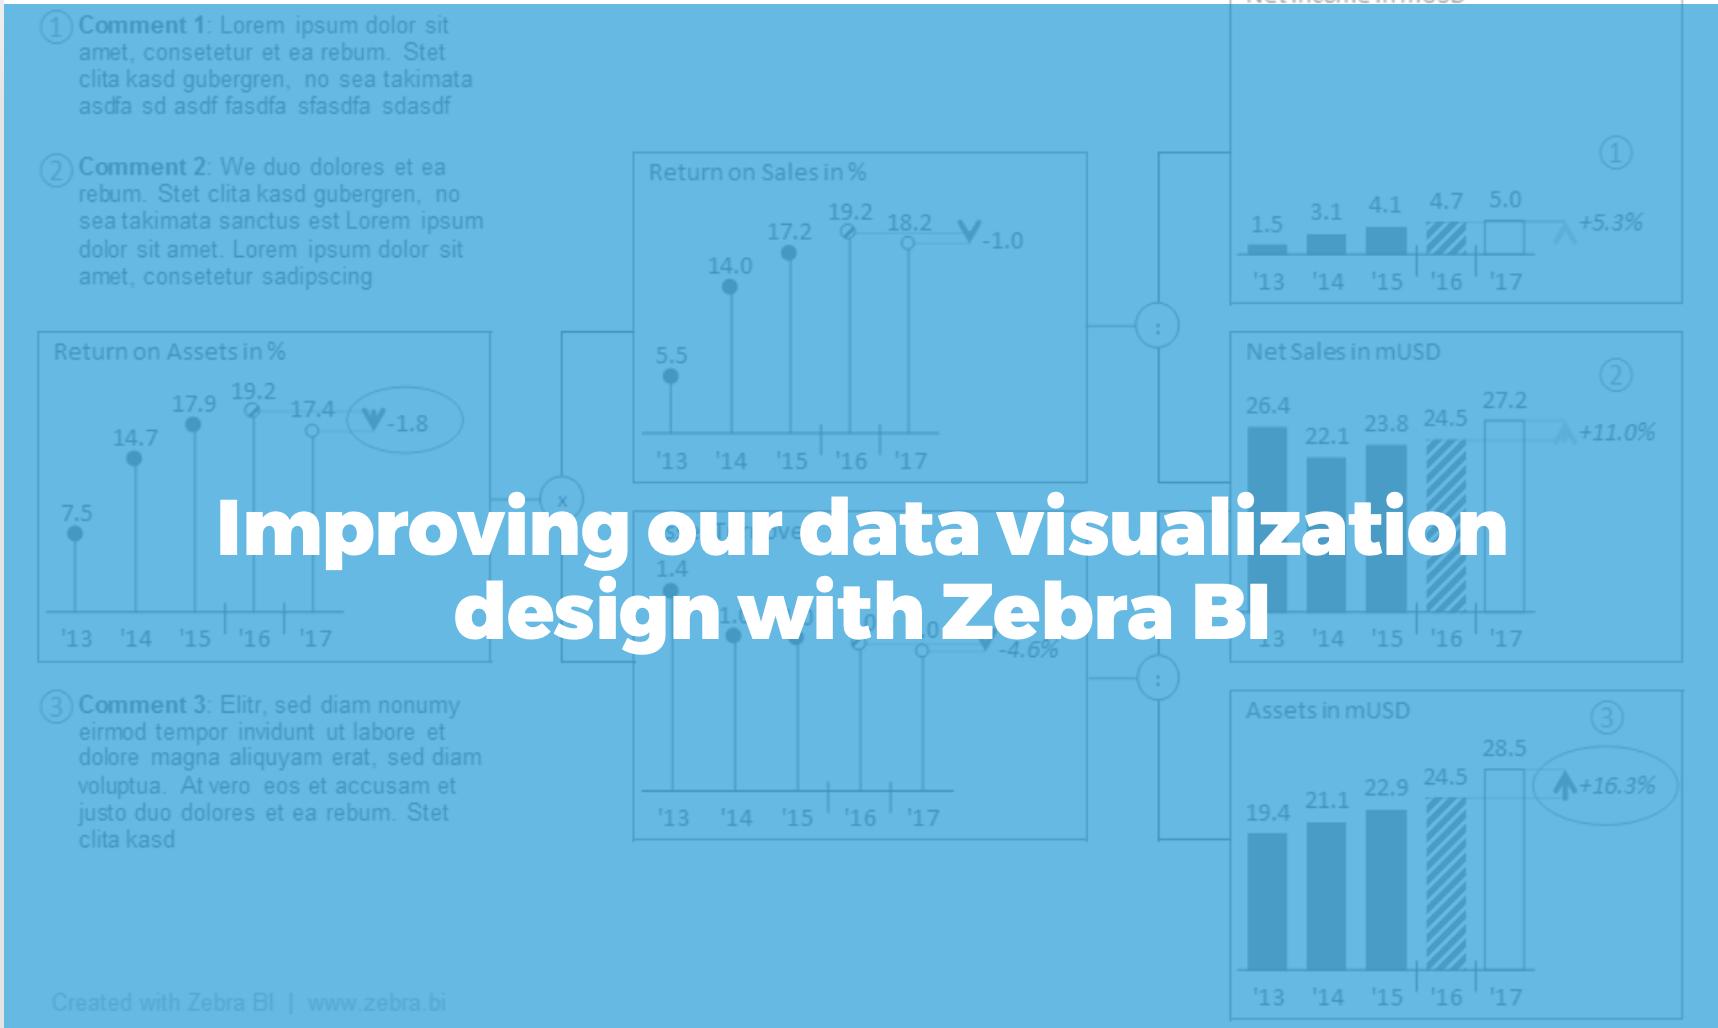 Bismart incorporates visuals from Zebra BI